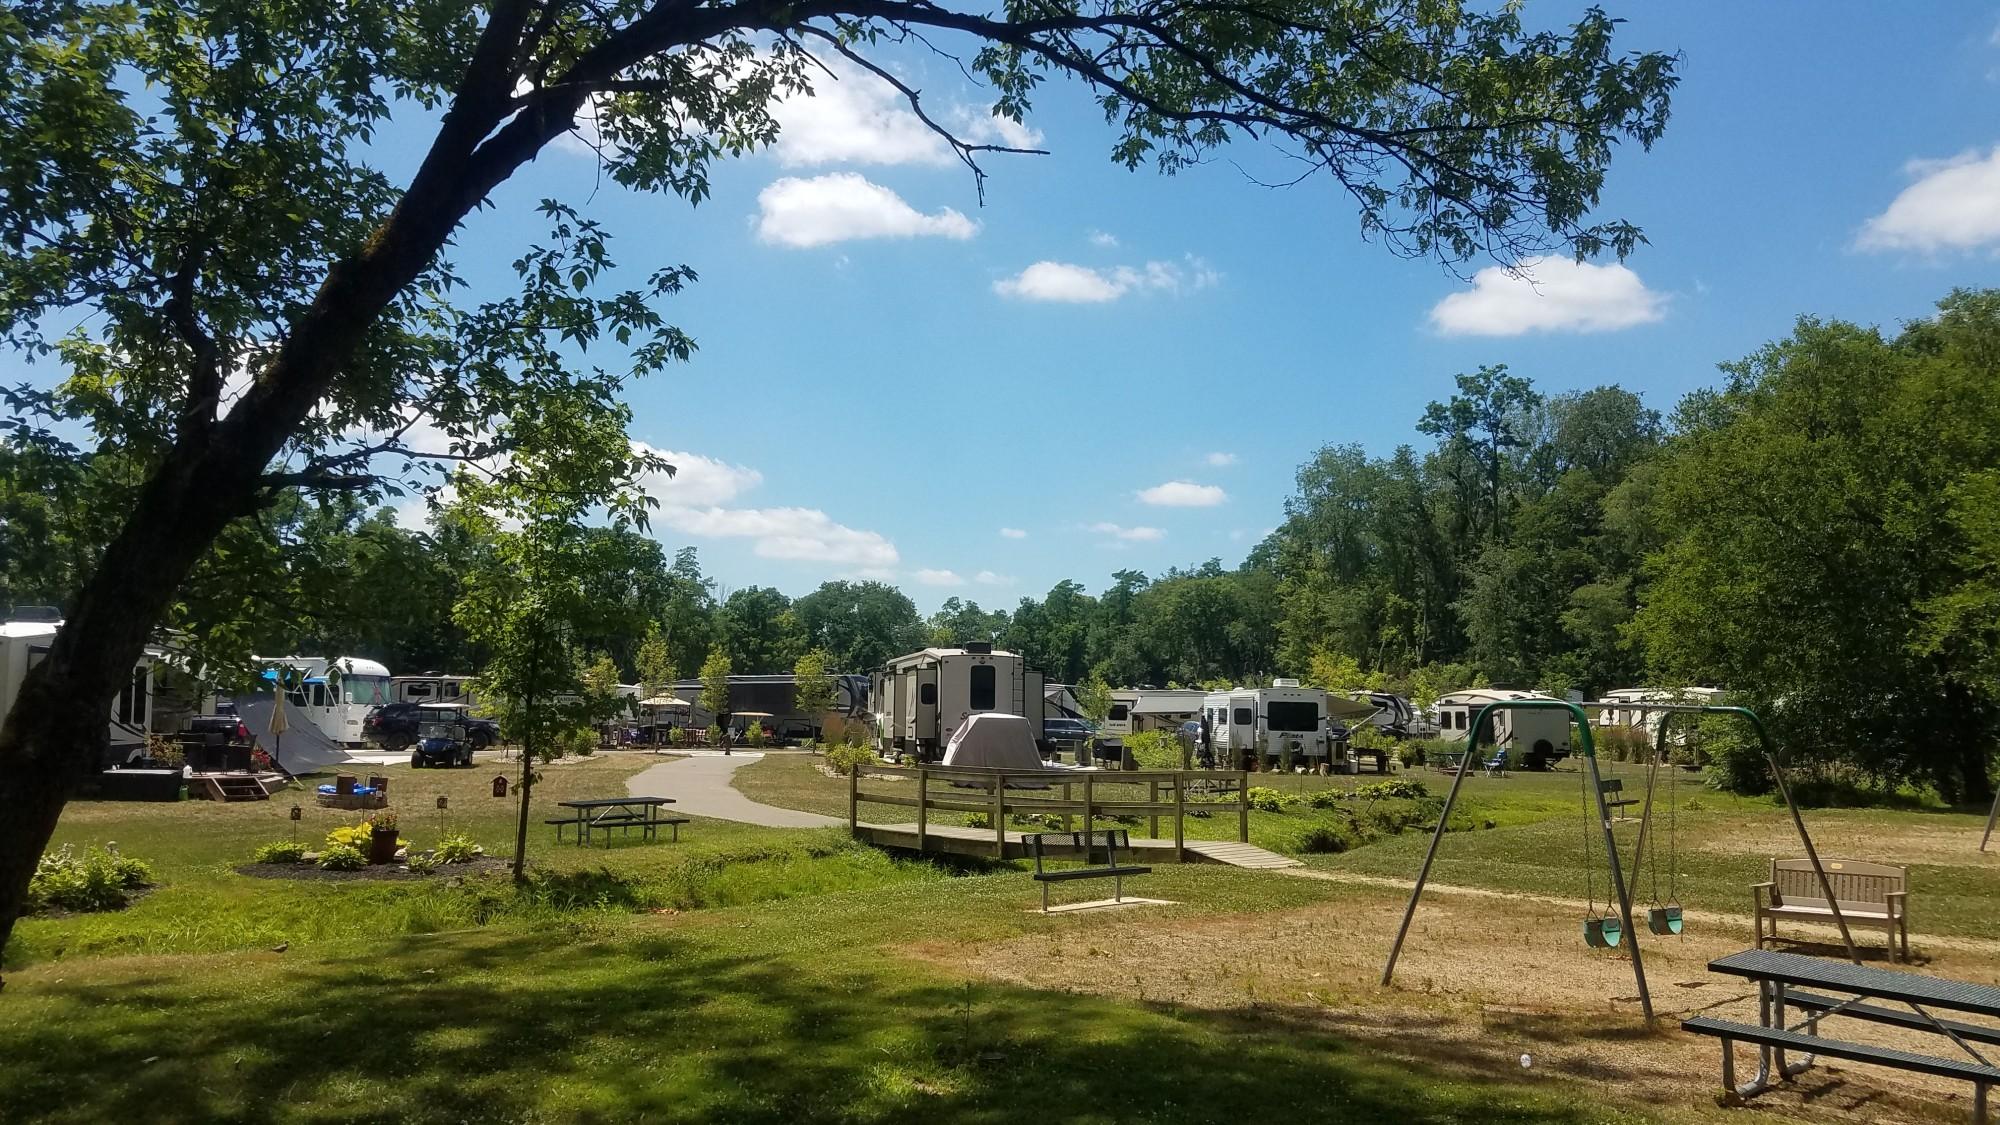 Camping Pleasant Hill Lake Park Ohio